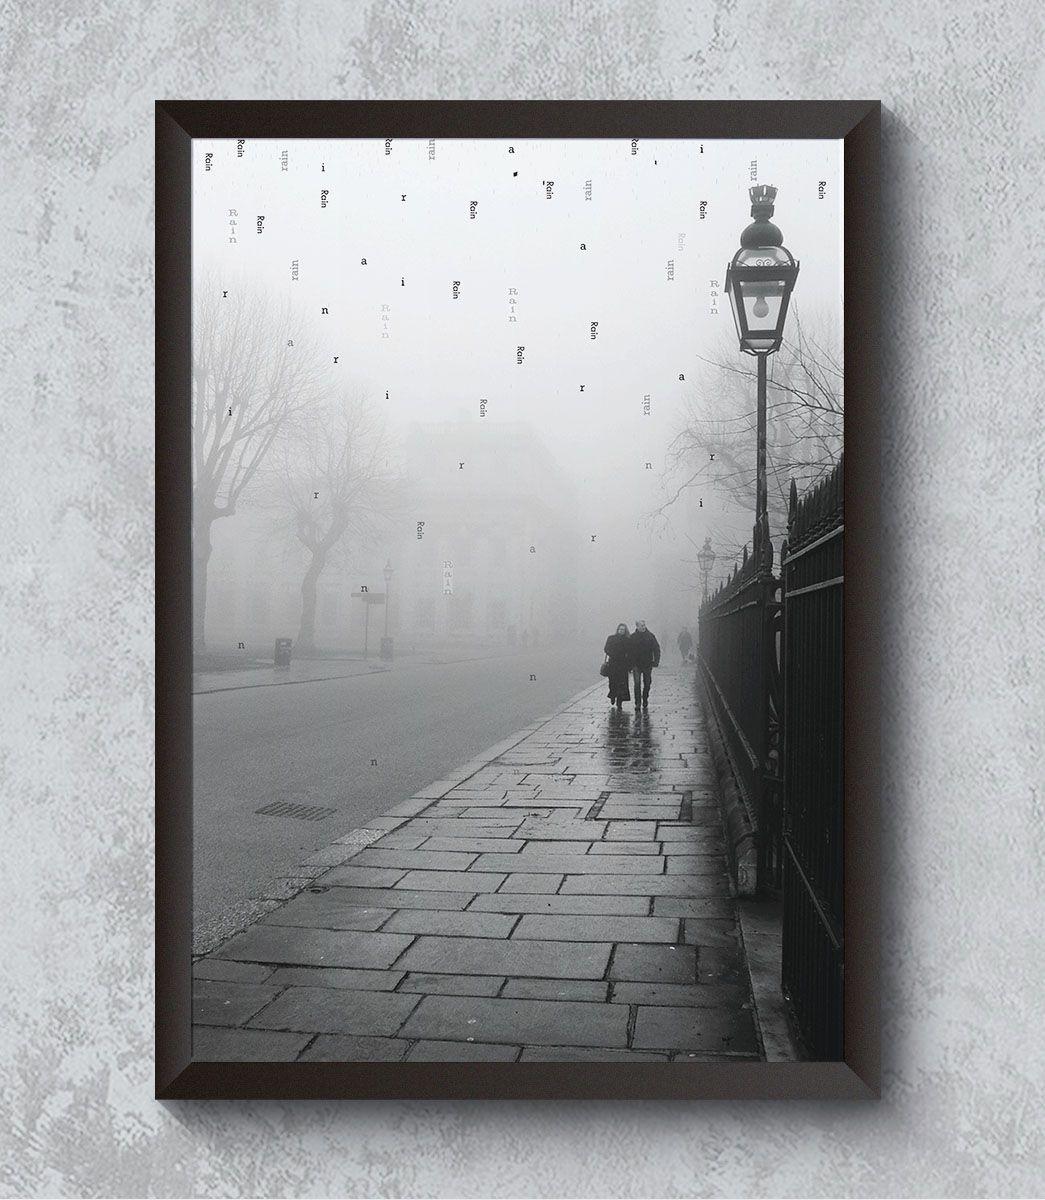 Decorativo - Is raining in London